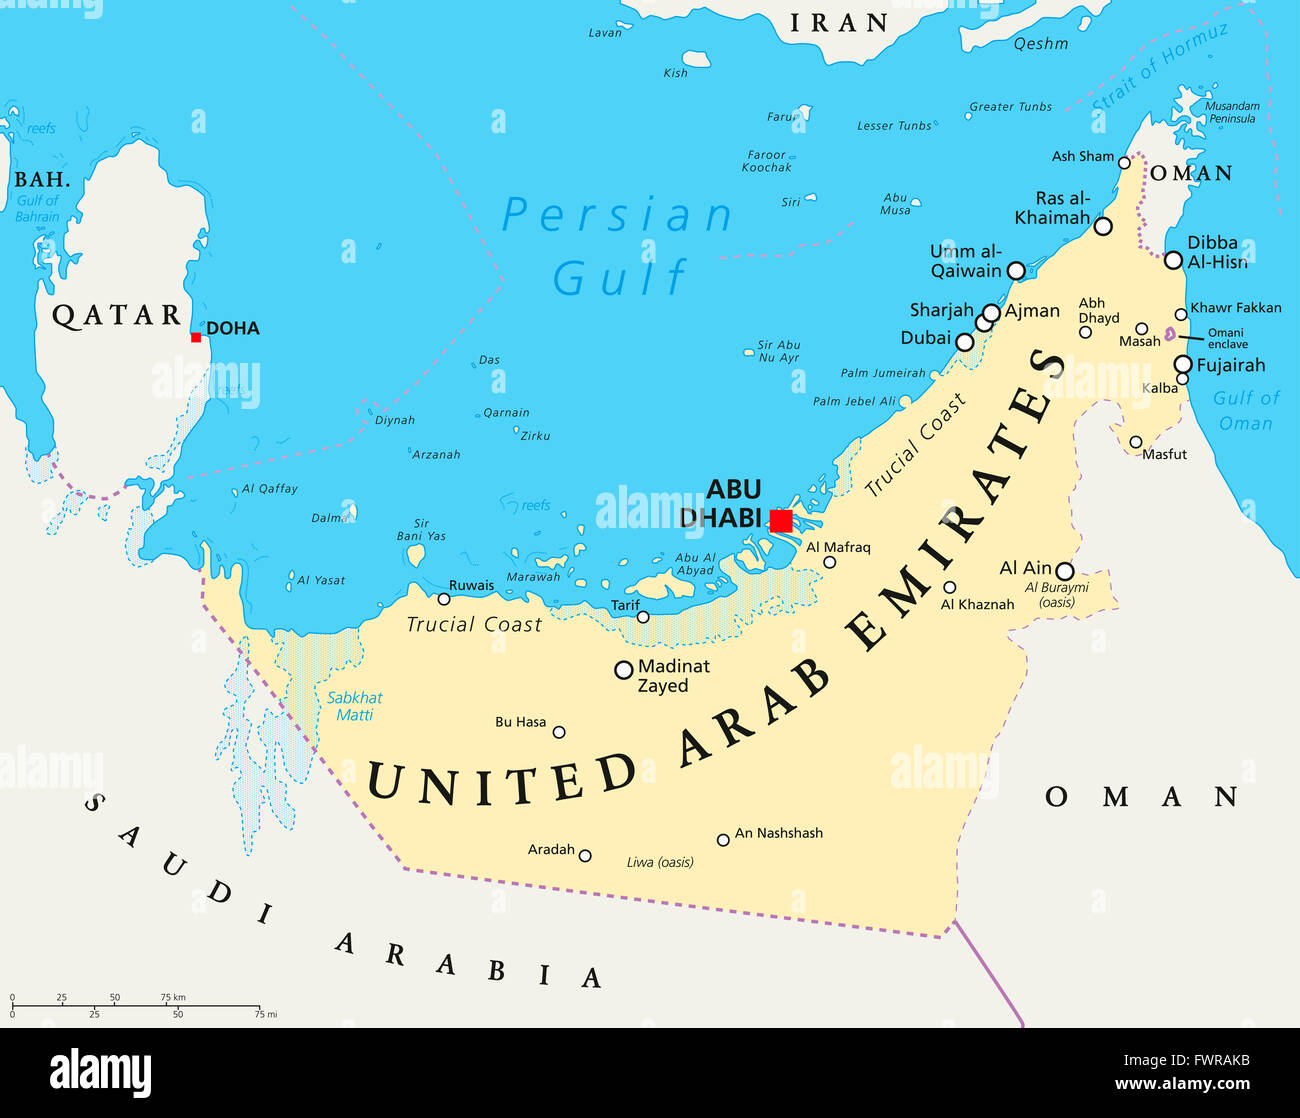 uae political map uae united arab emirates political map with capital abu uae political map uae united arab emirates political map